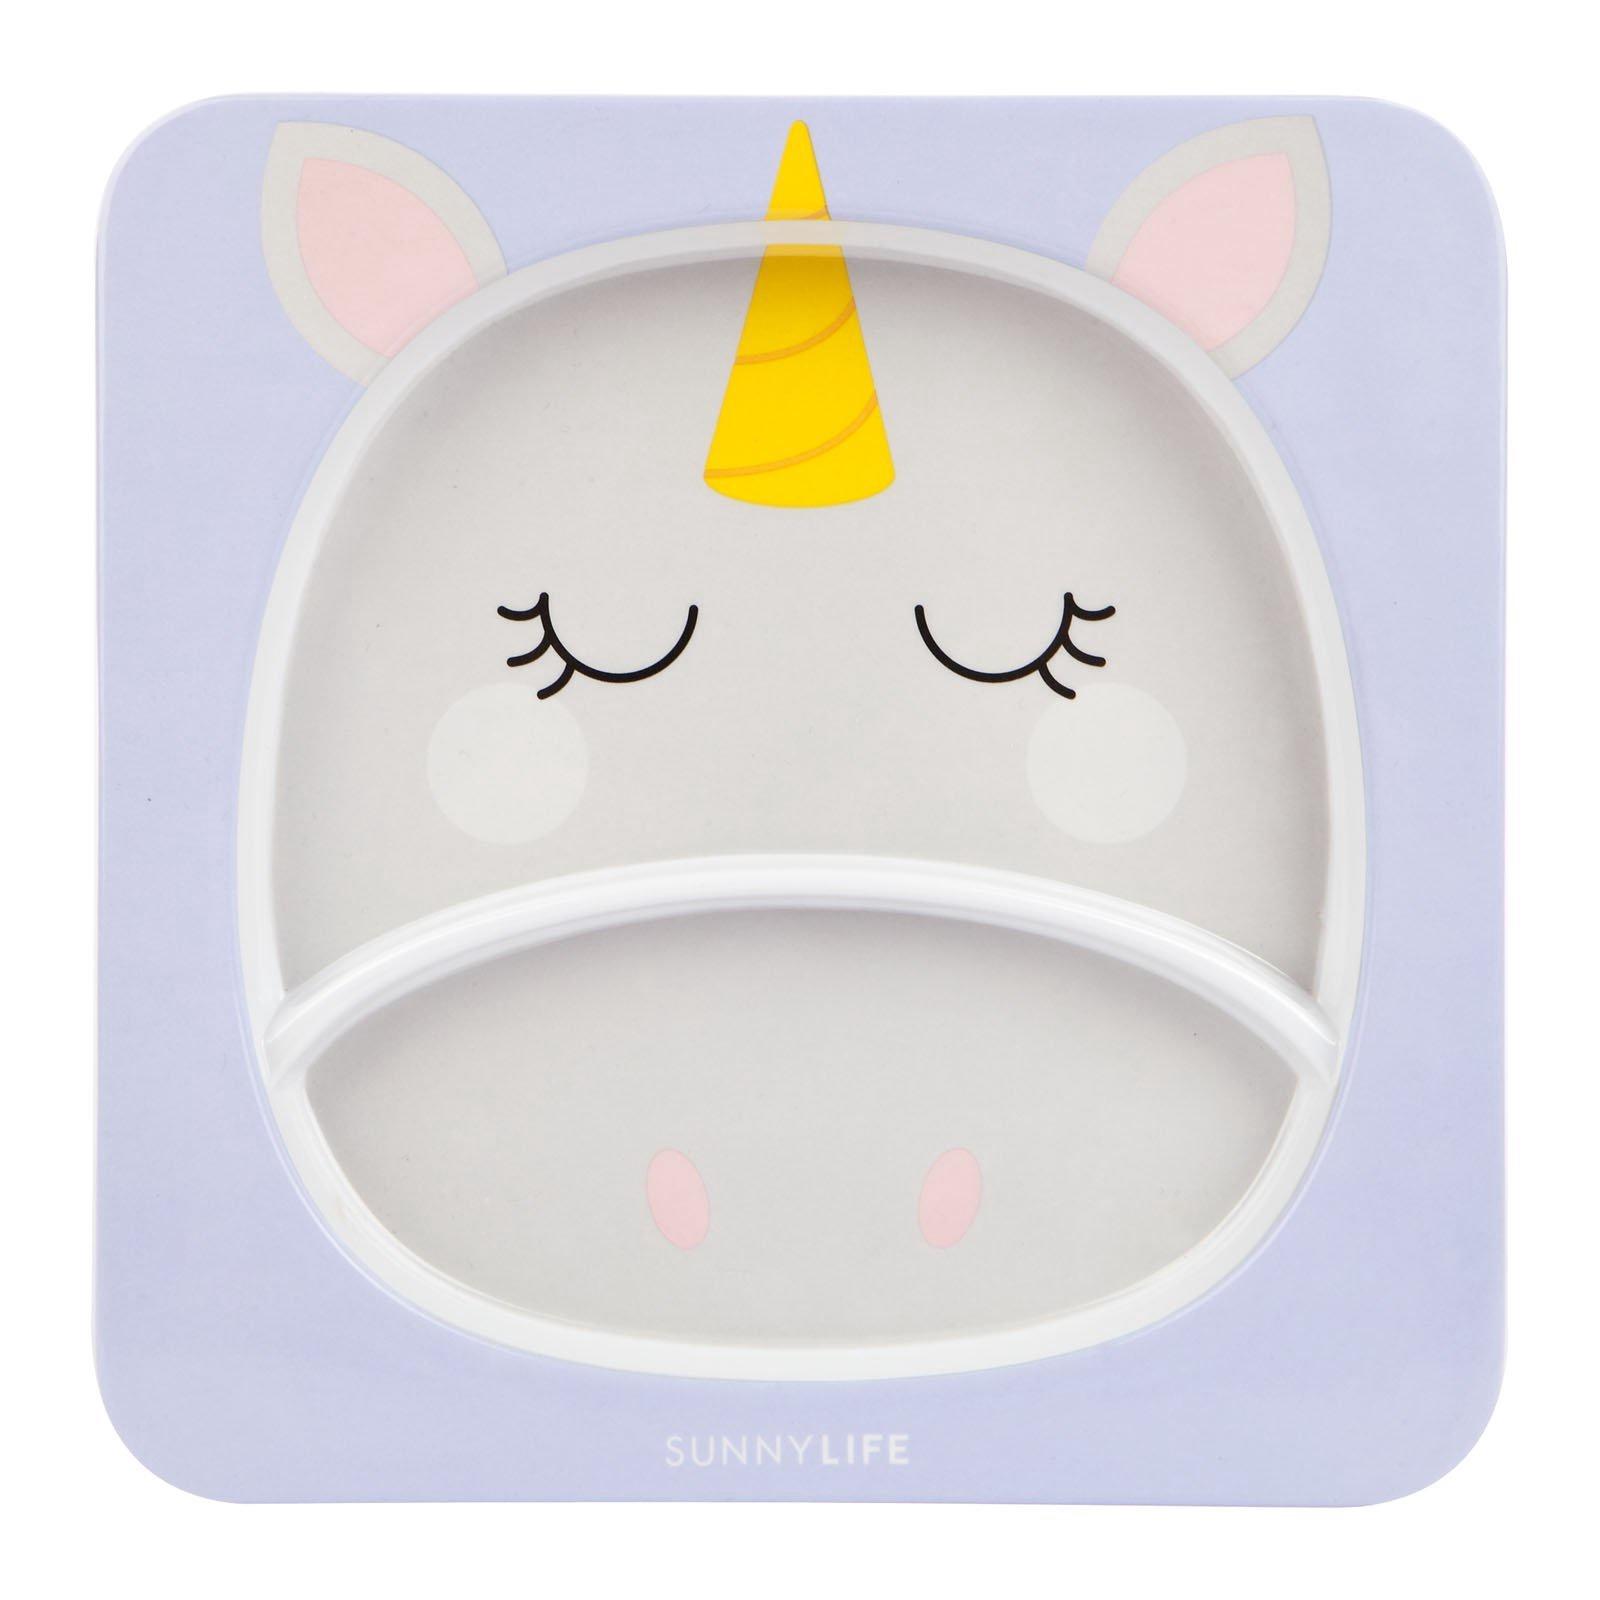 Sunny Life Kids Plate Unicorn